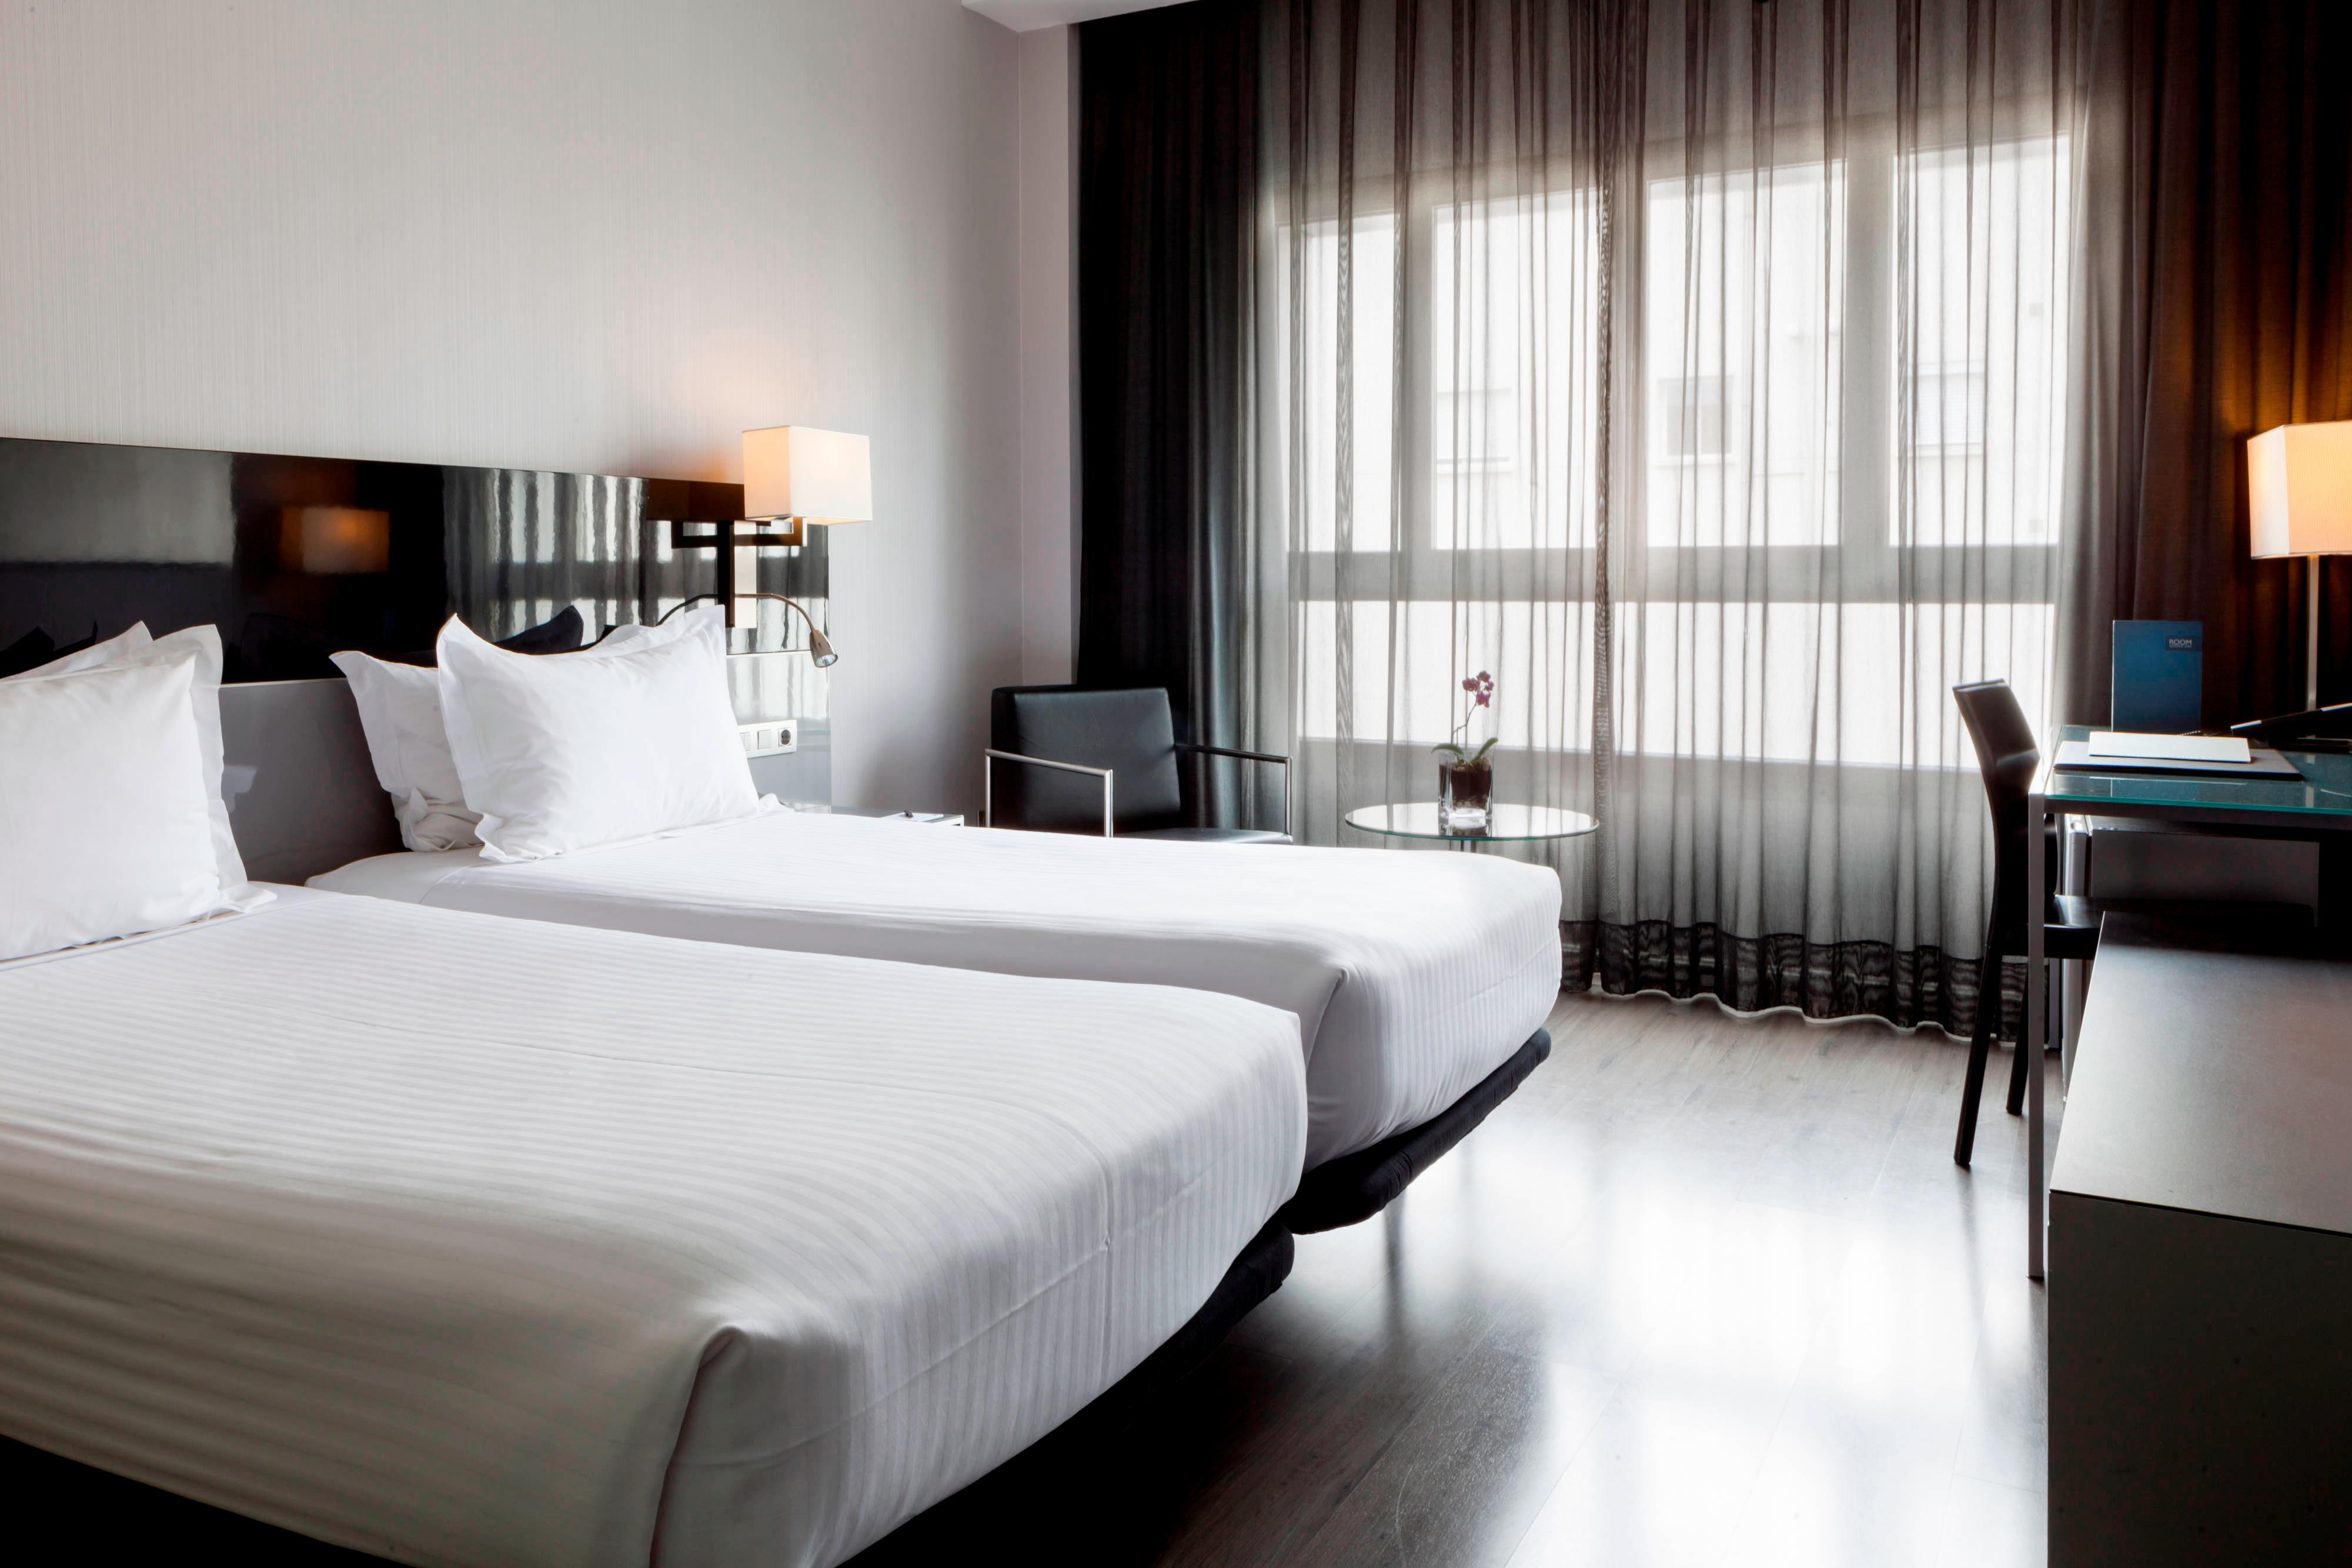 Habitaciones hoteles sevilla ac hotel sevilla torneo for Hoteles en sevilla con habitaciones cuadruples